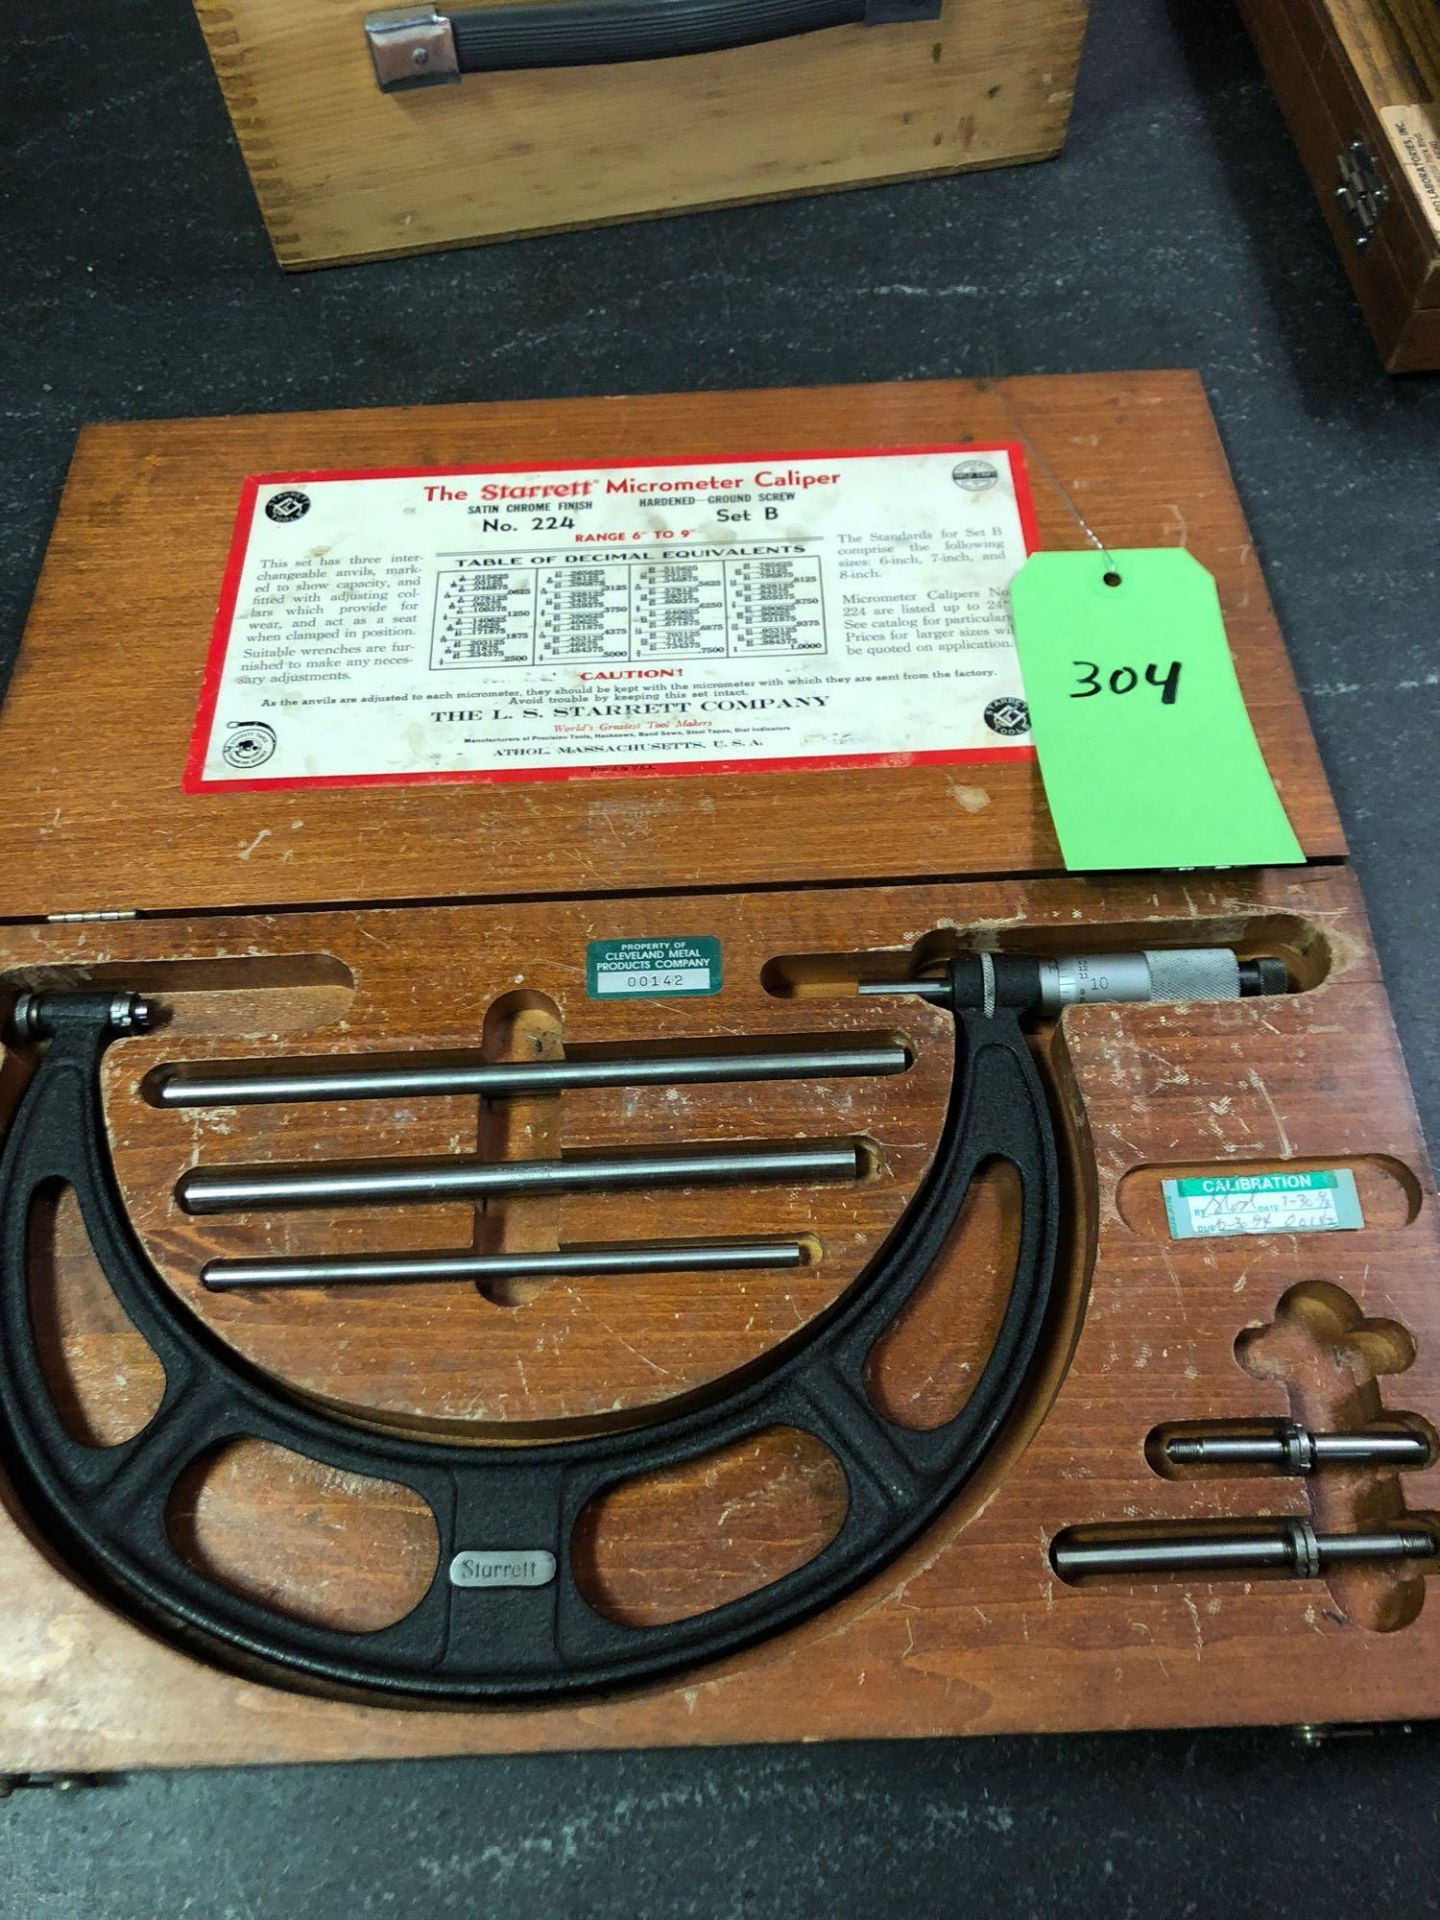 Lotto 304 - Starrett Micrometer Caliper #224 Set B